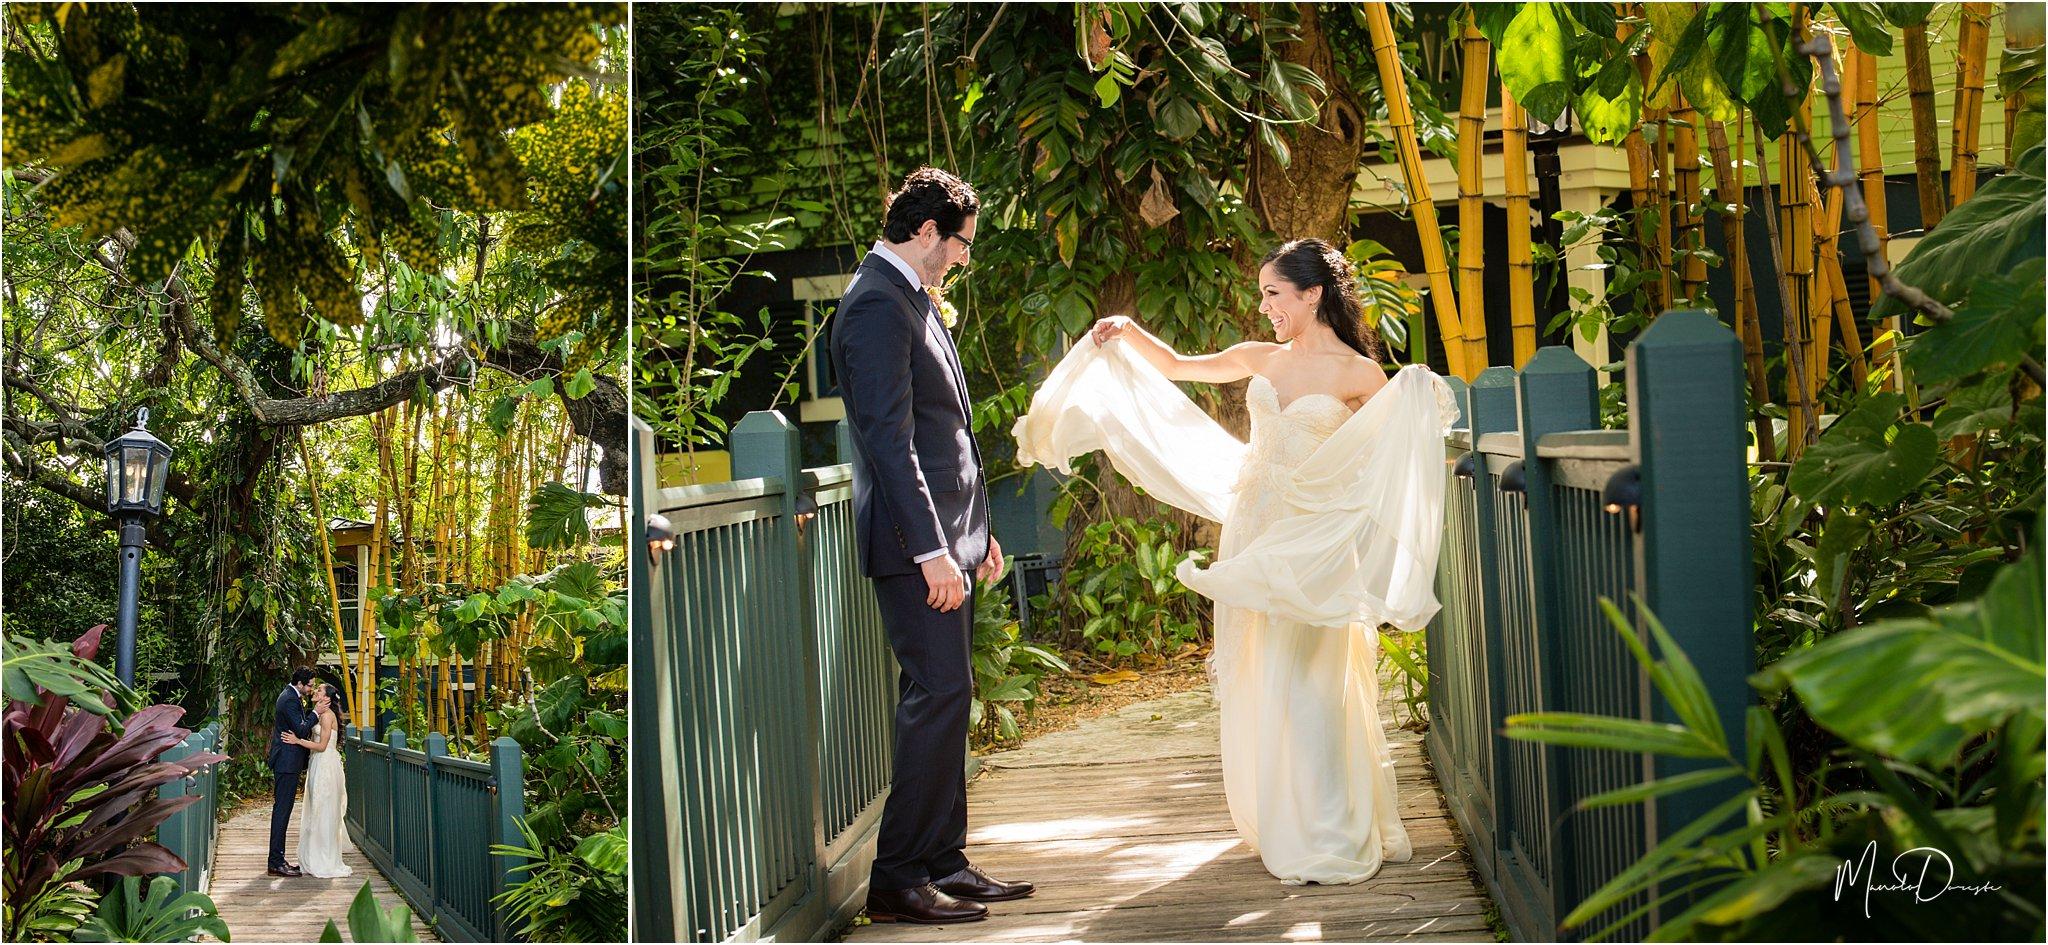 0510_ManoloDoreste_InFocusStudios_Wedding_Family_Photography_Miami_MiamiPhotographer.jpg